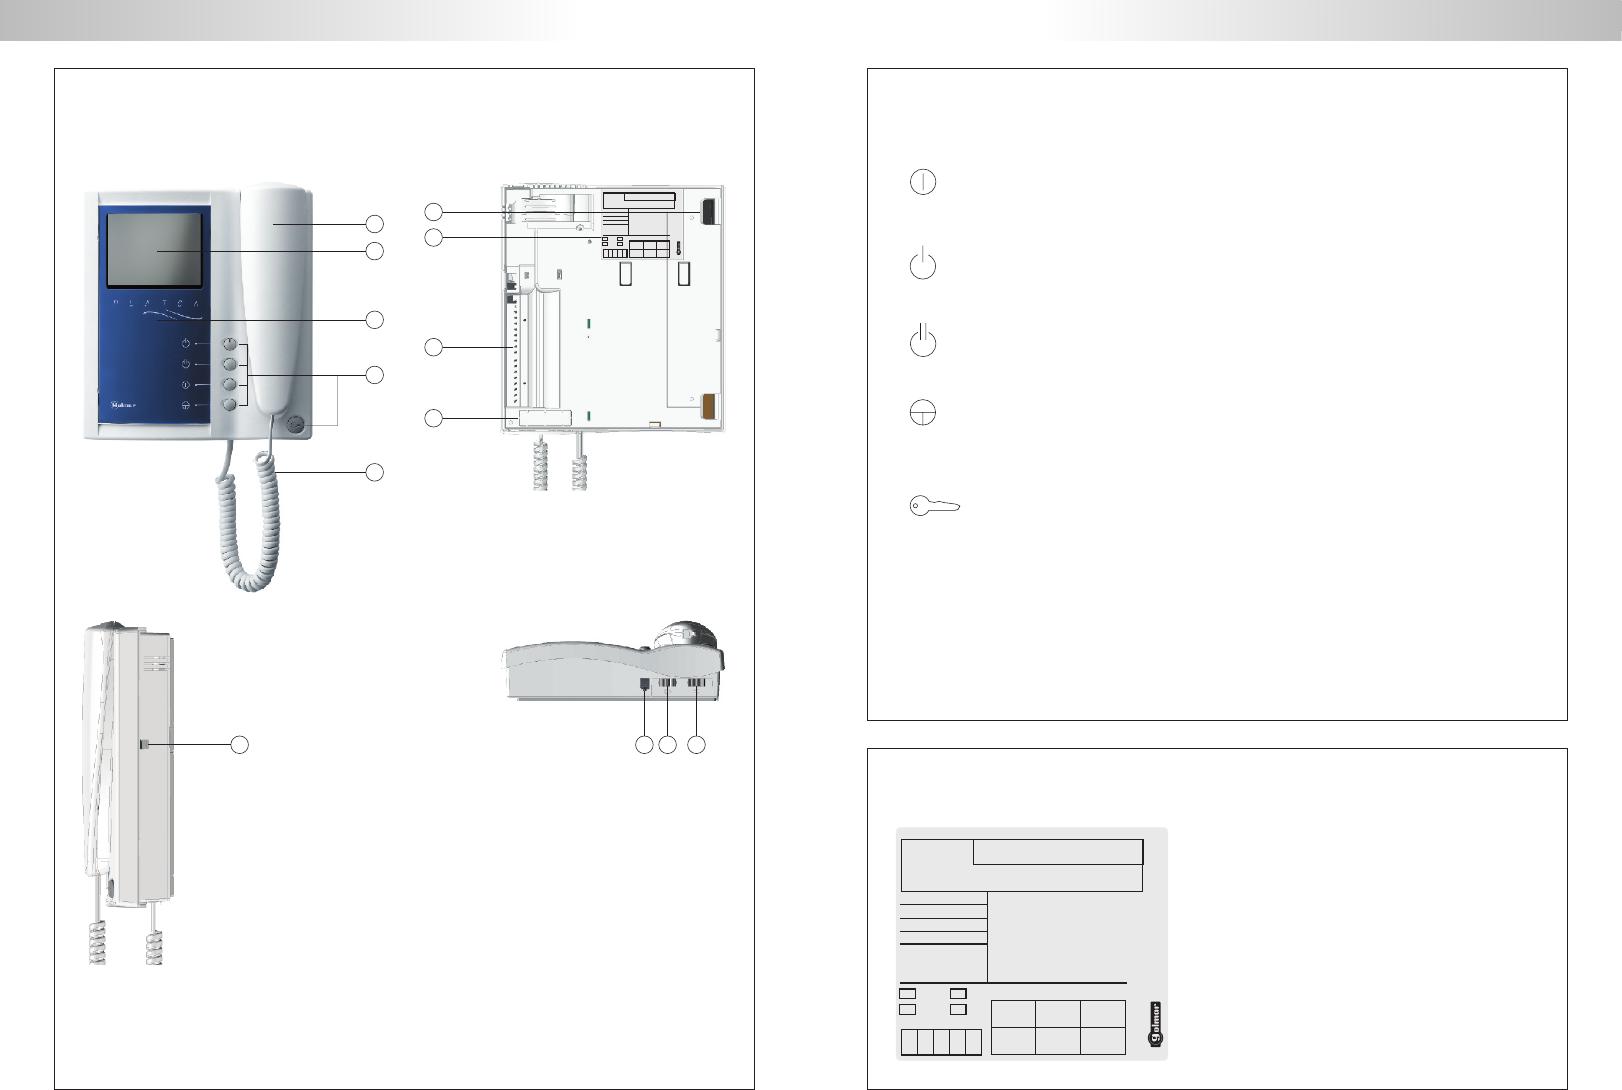 handleiding golmar stadio plus t500en pagina 9 van 18 english rh gebruikershandleiding com Wired Intercom Systems Nutone Intercom Wiring-Diagram